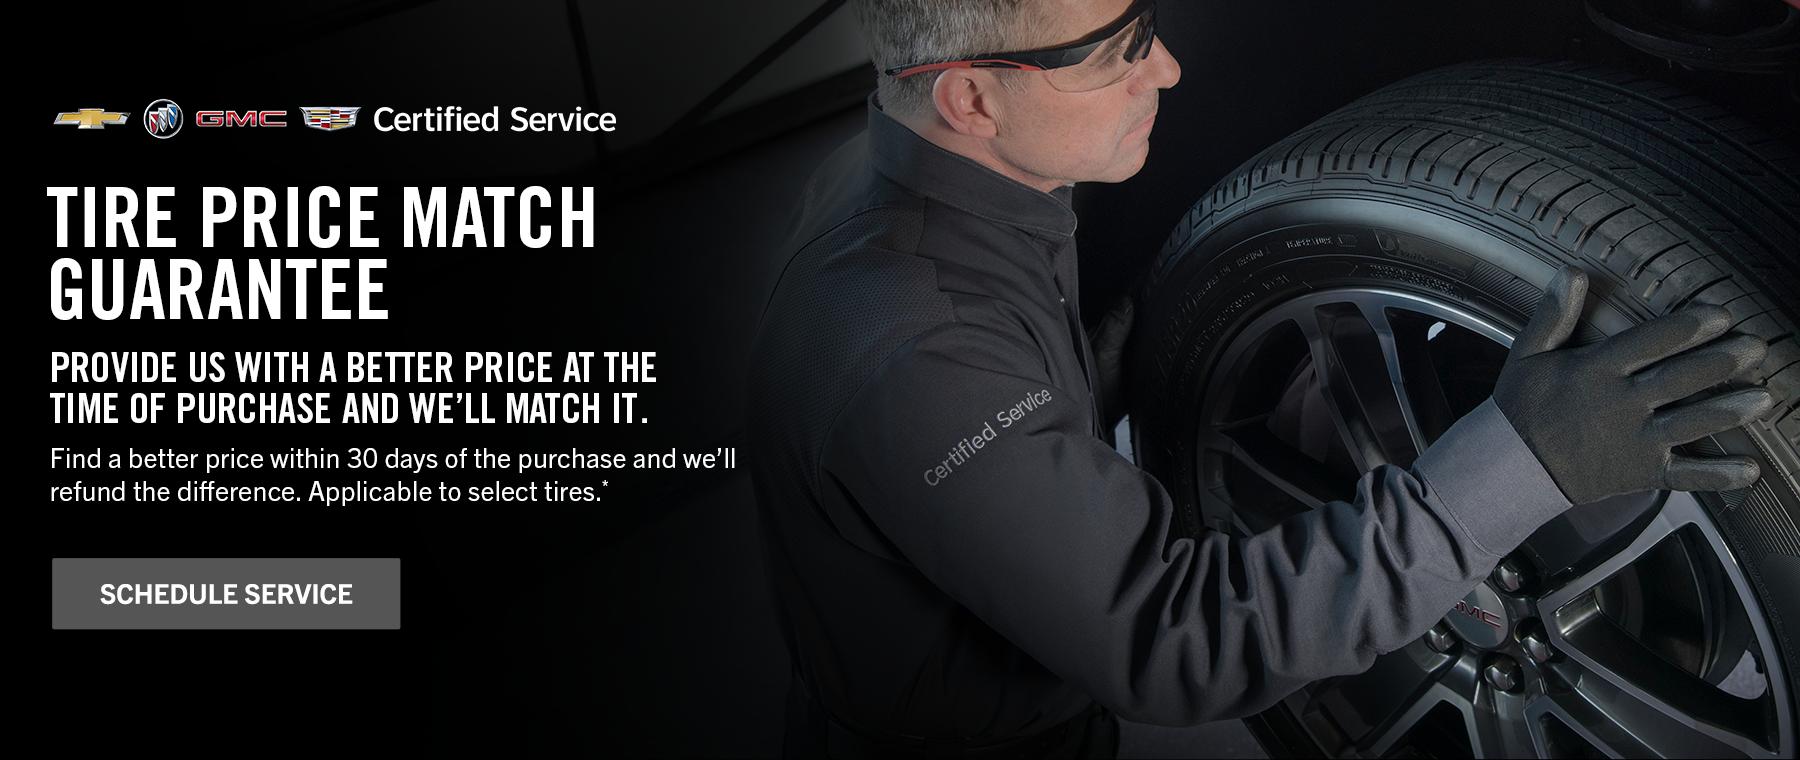 Tire Price Match Event